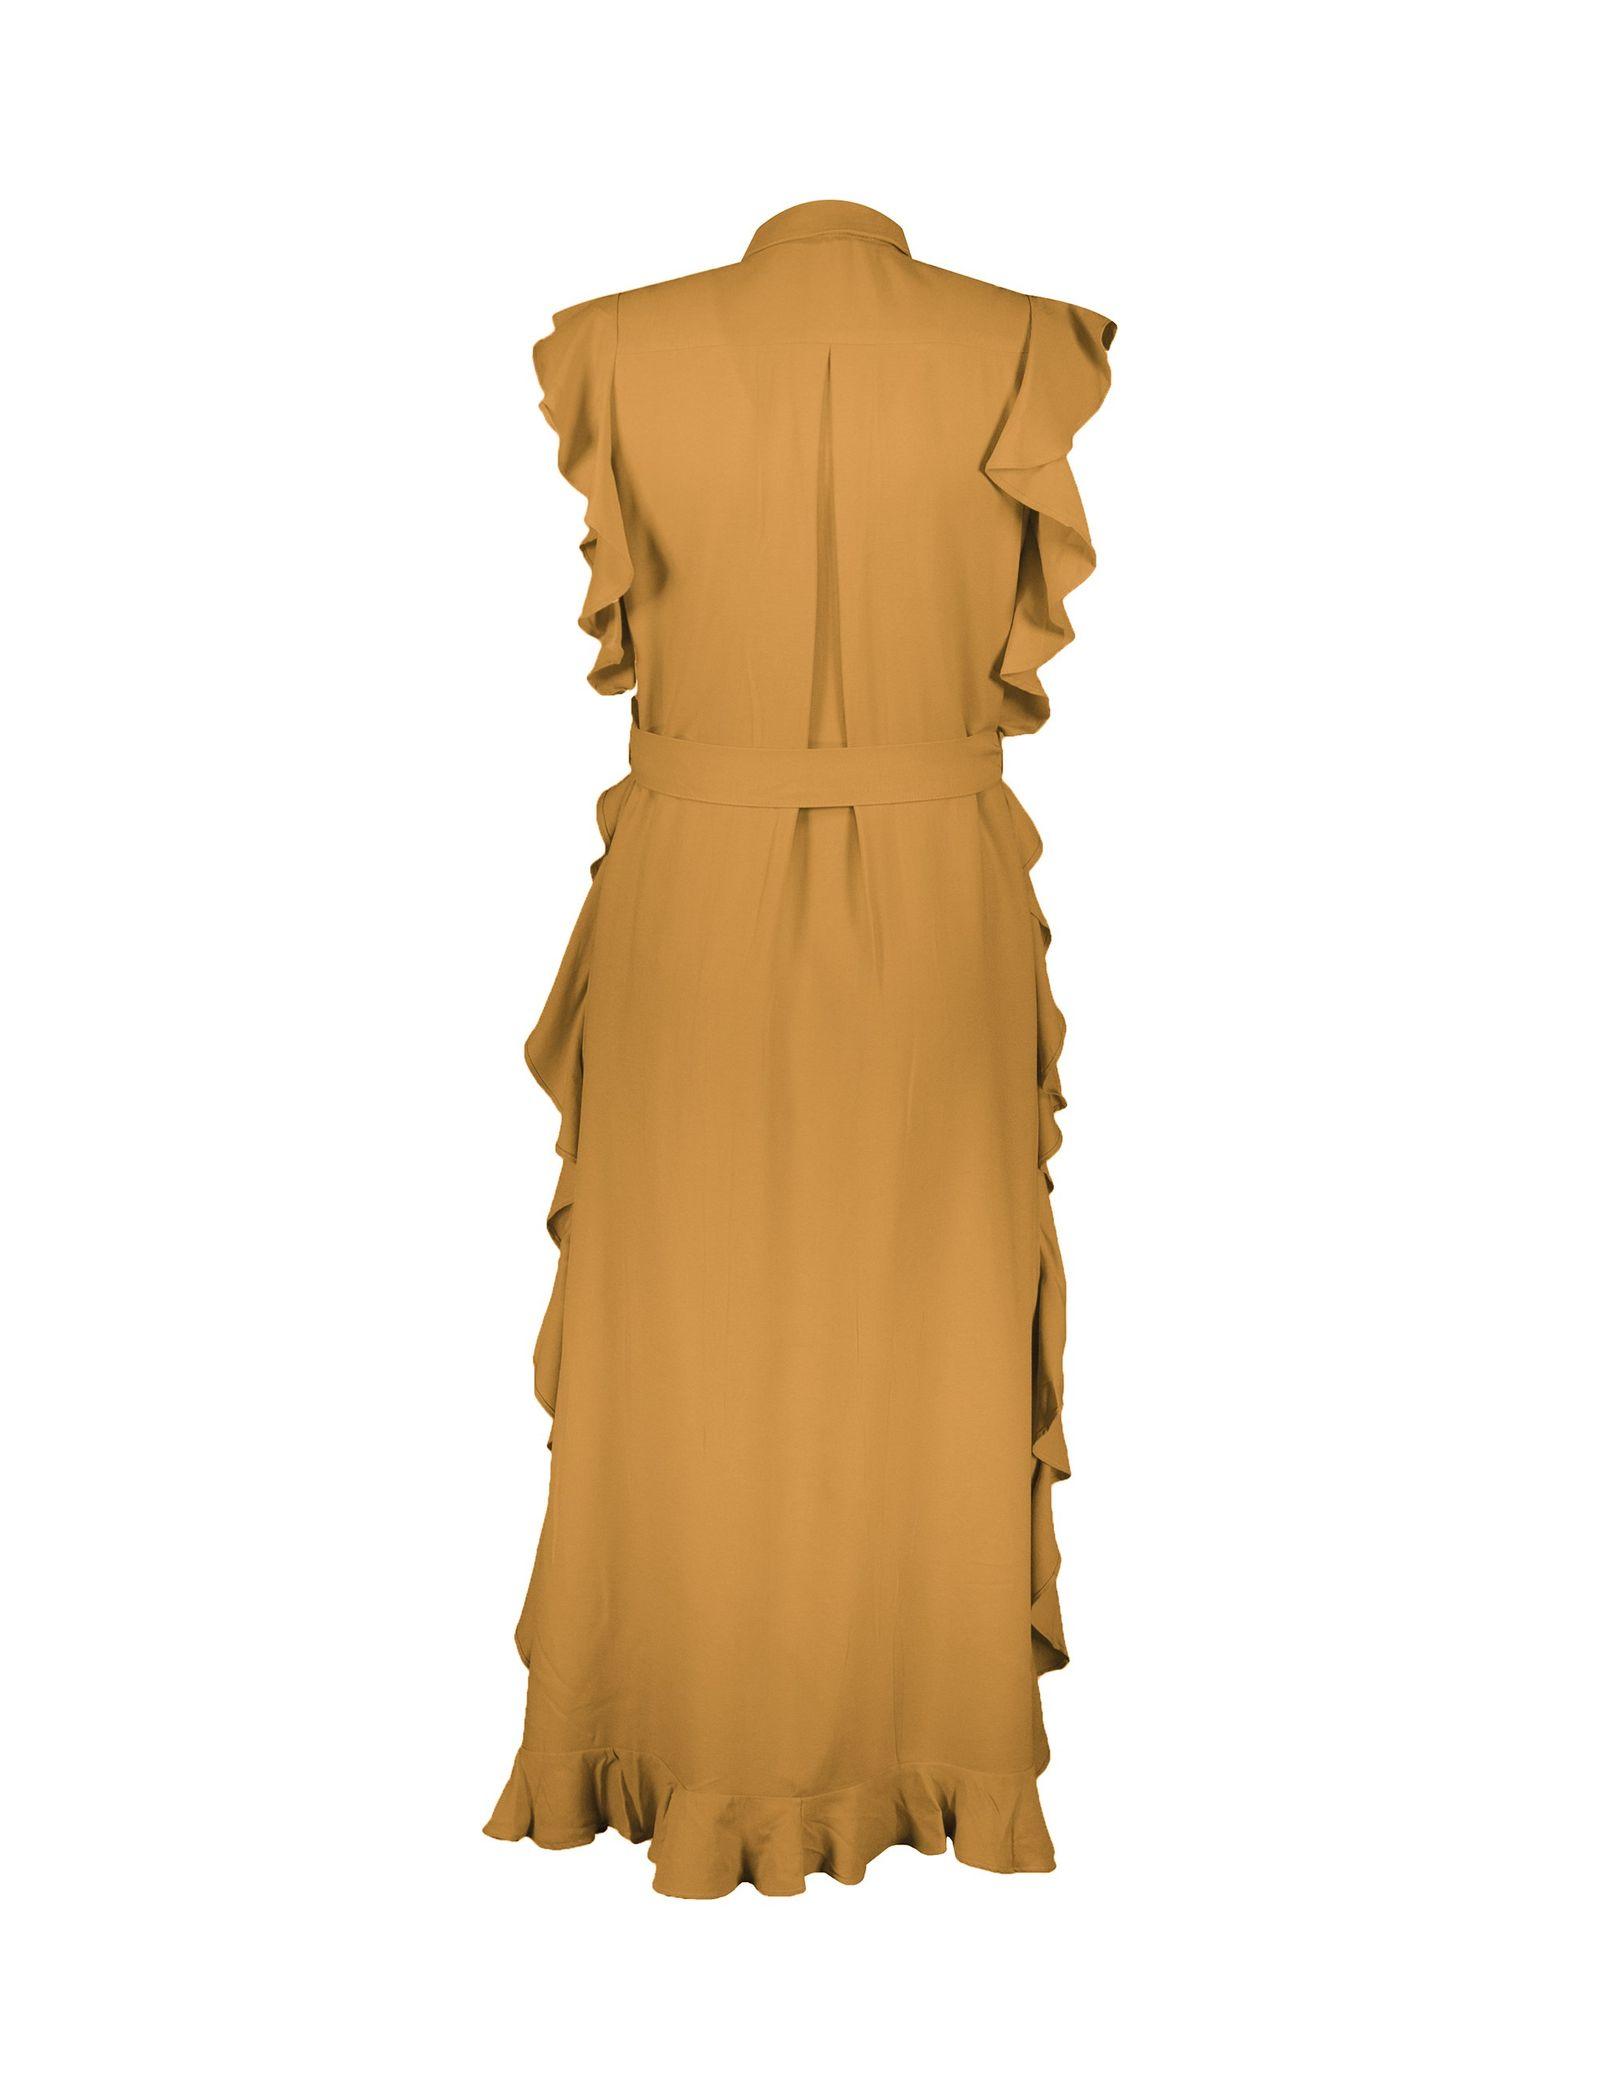 پیراهن ویسکوز بلند زنانه - کوتون - نارنجي - 2